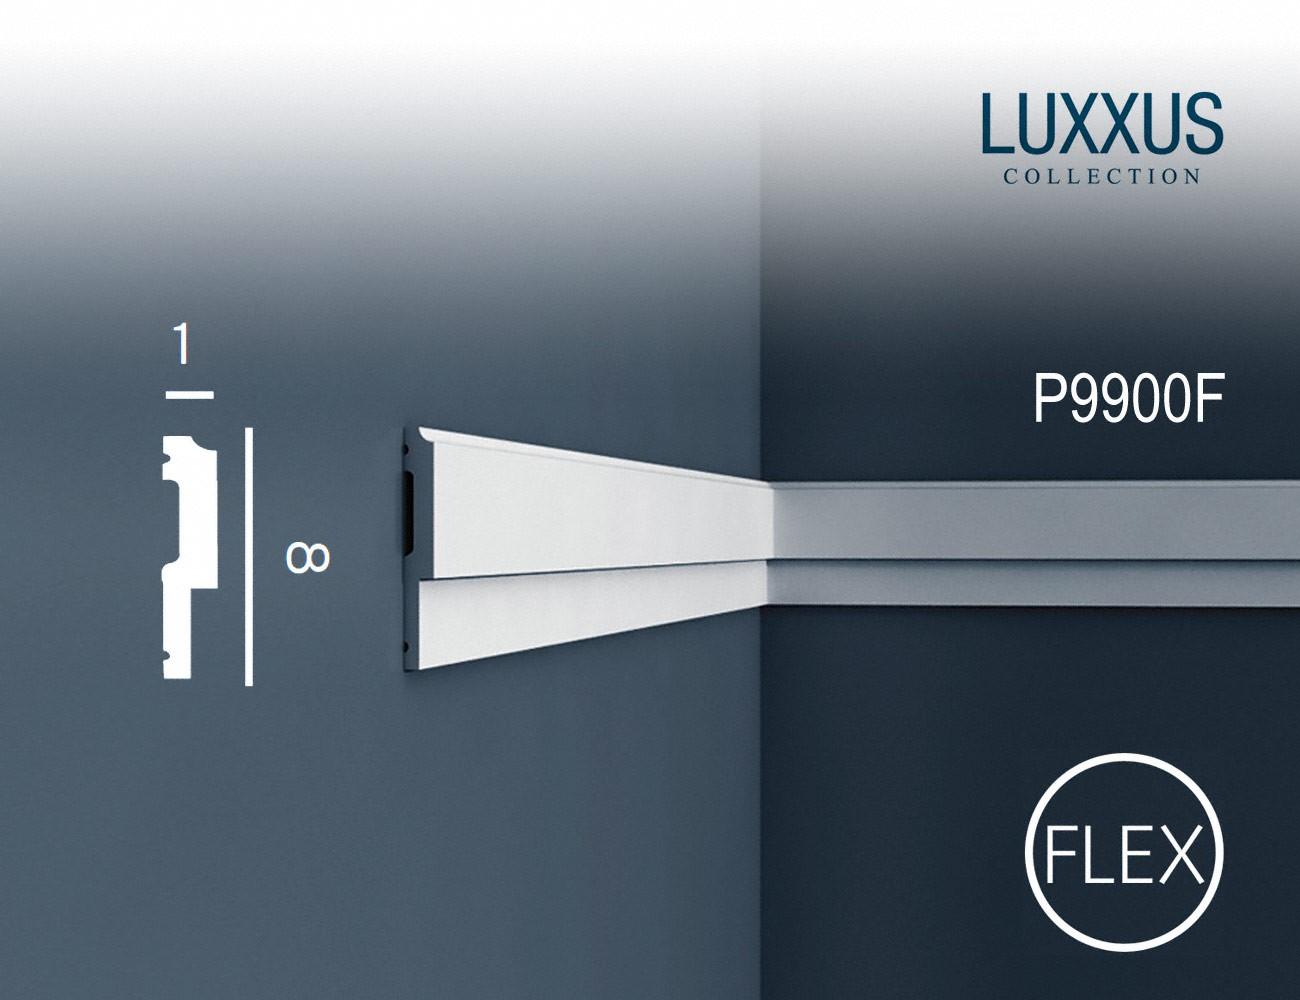 Element Decorativ Luxxus P9900f Orac Decor